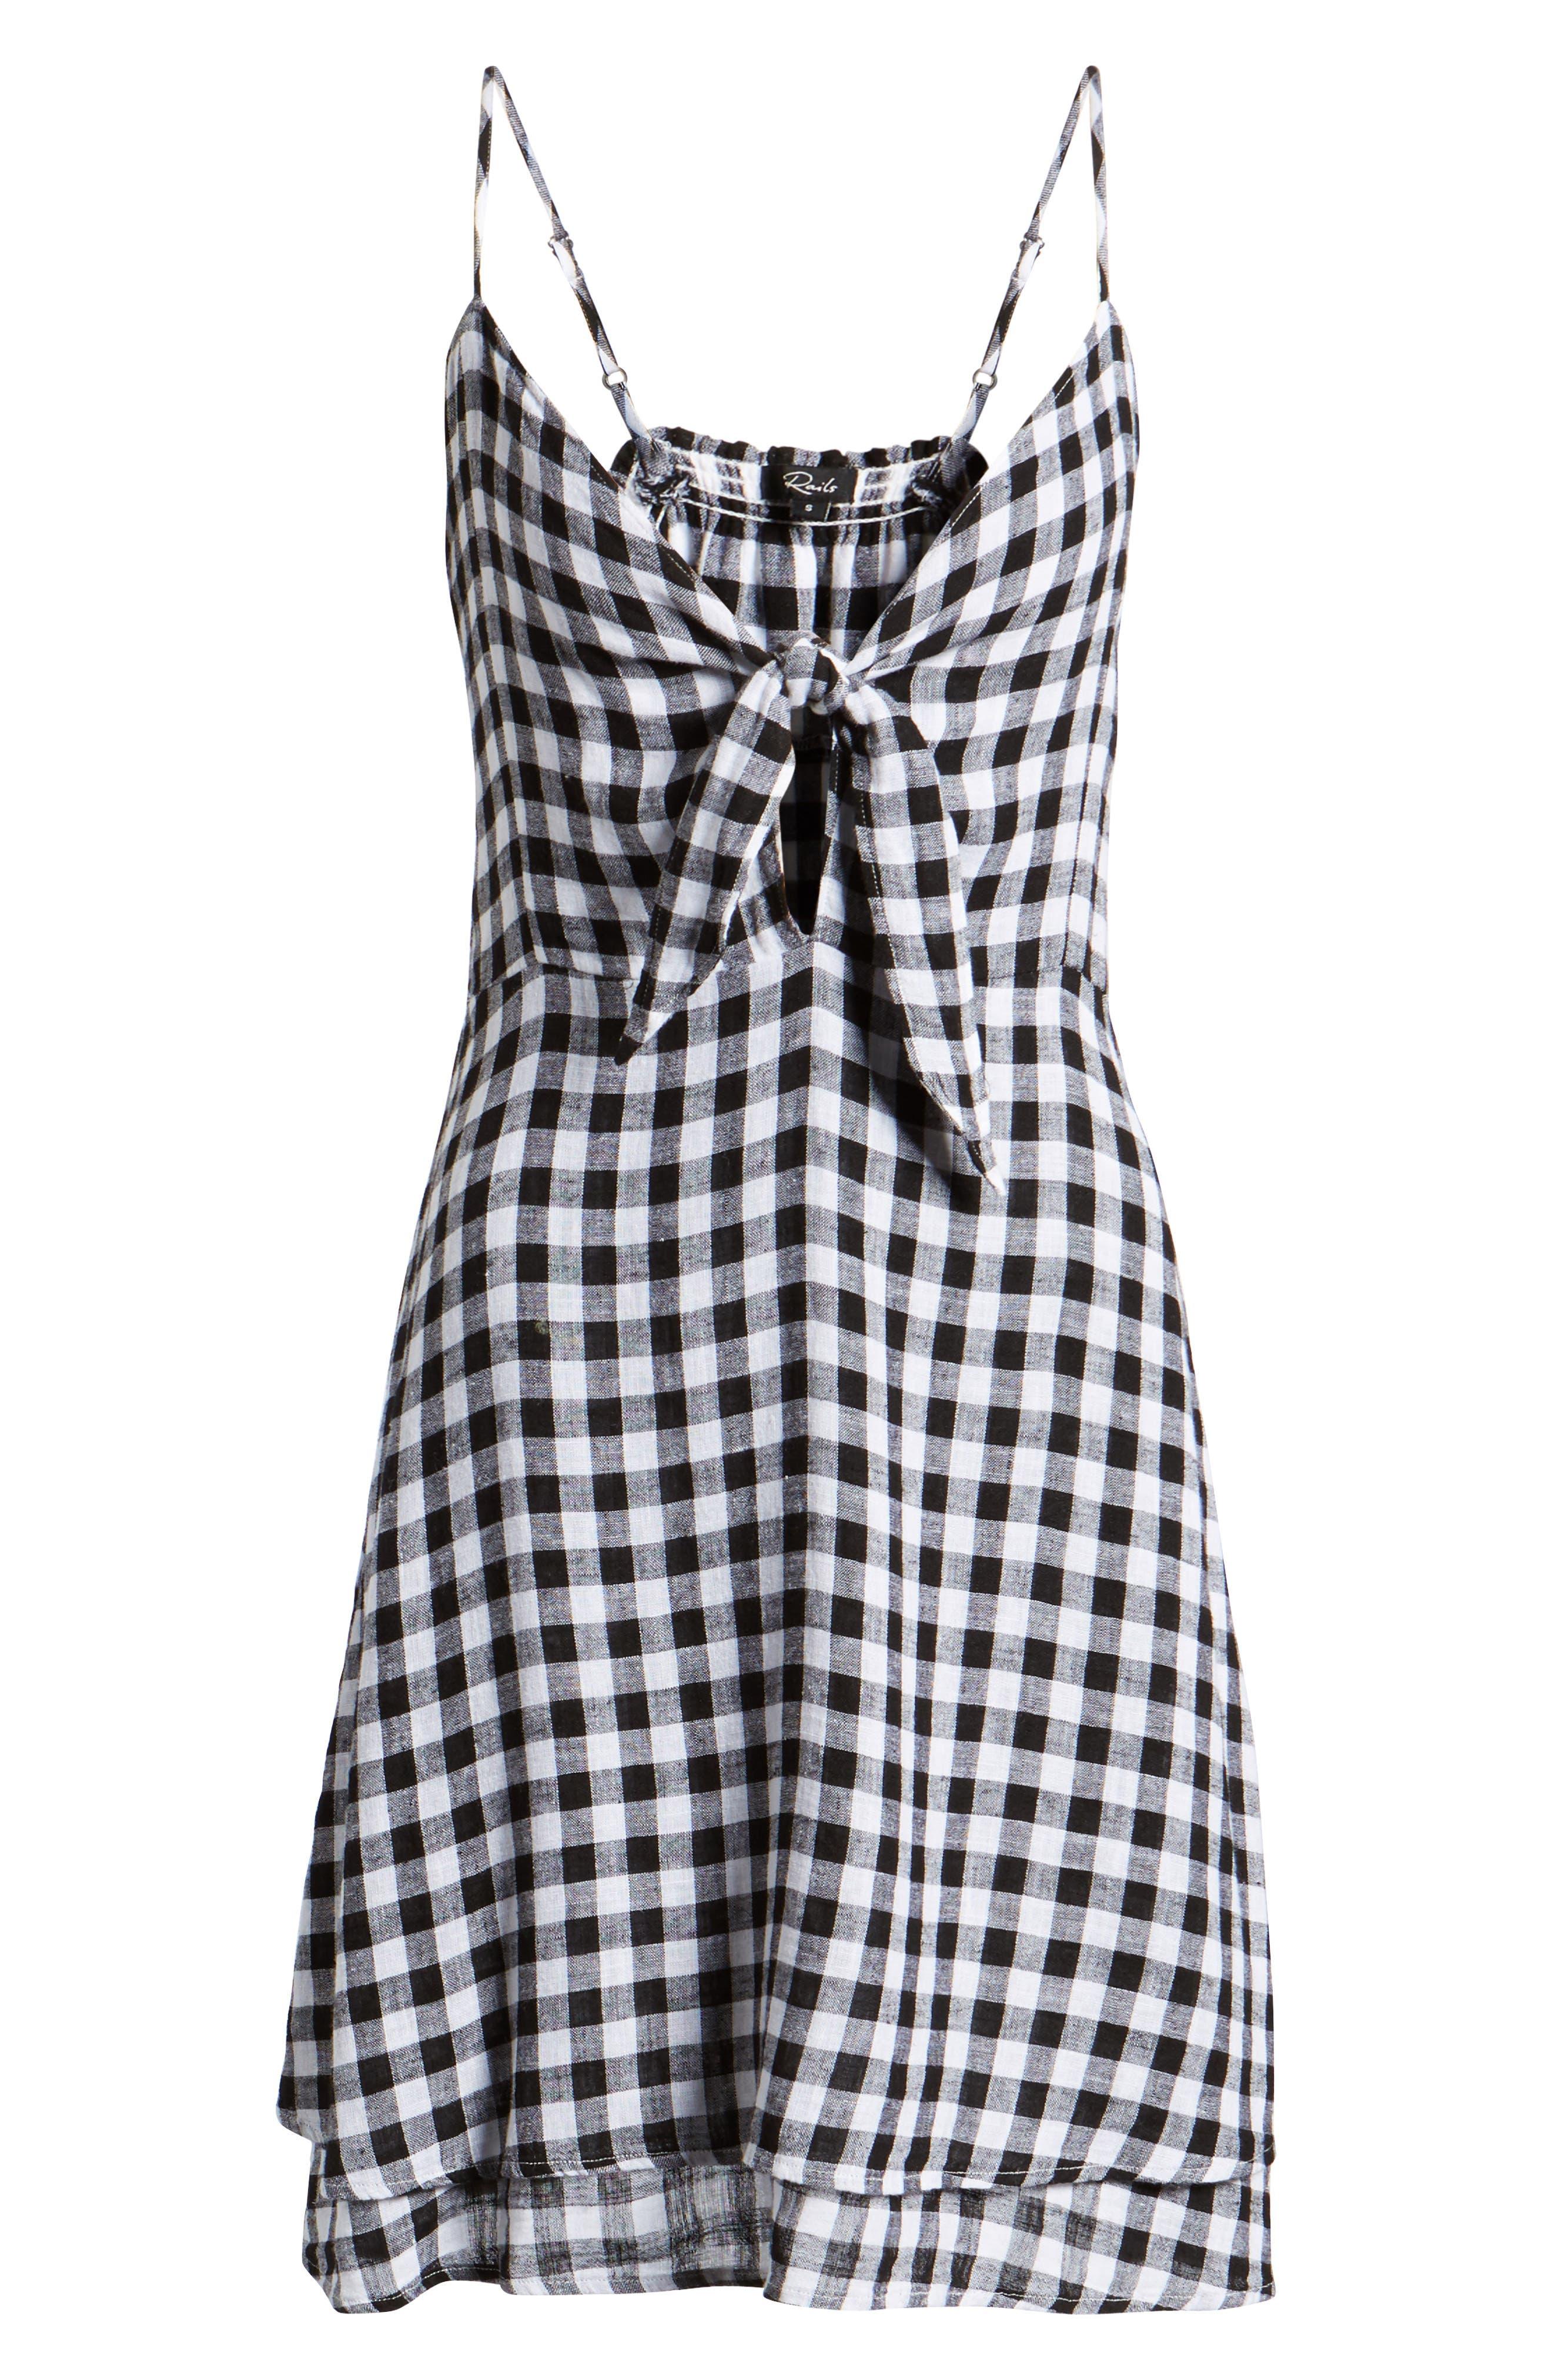 August Gingham Tie Front Dress,                             Alternate thumbnail 6, color,                             Black Gingham